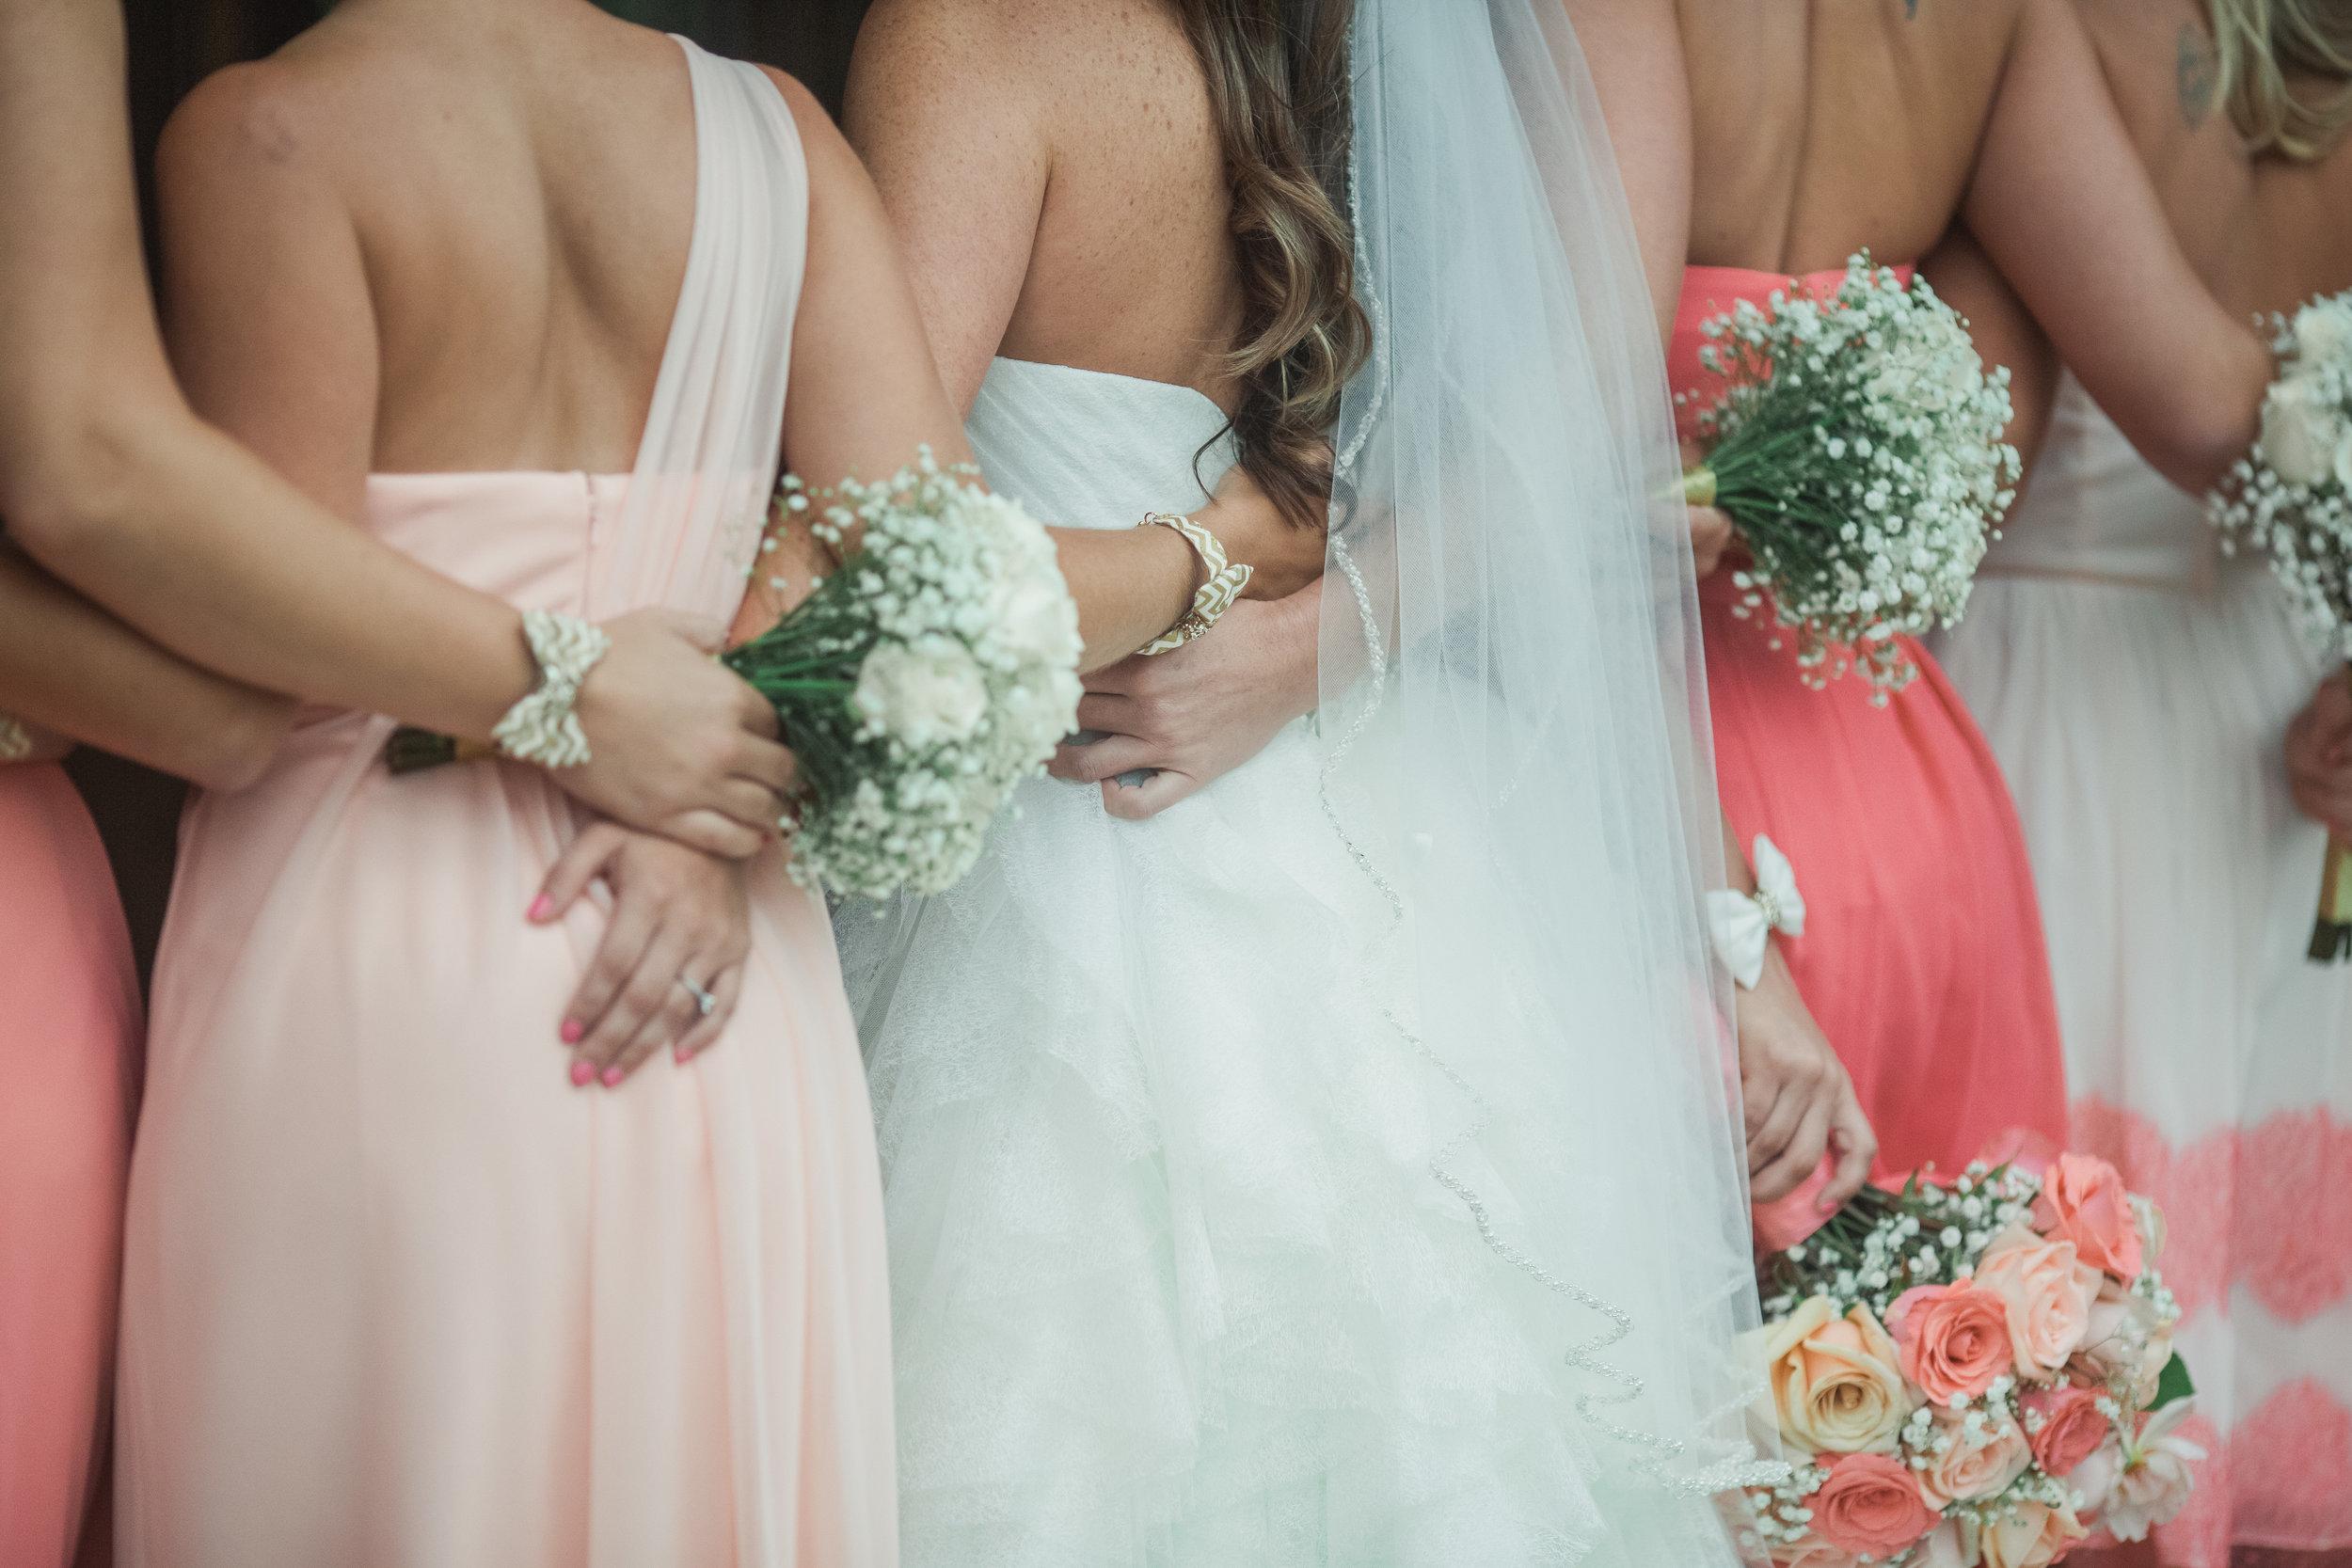 Bridesmaids92.jpg